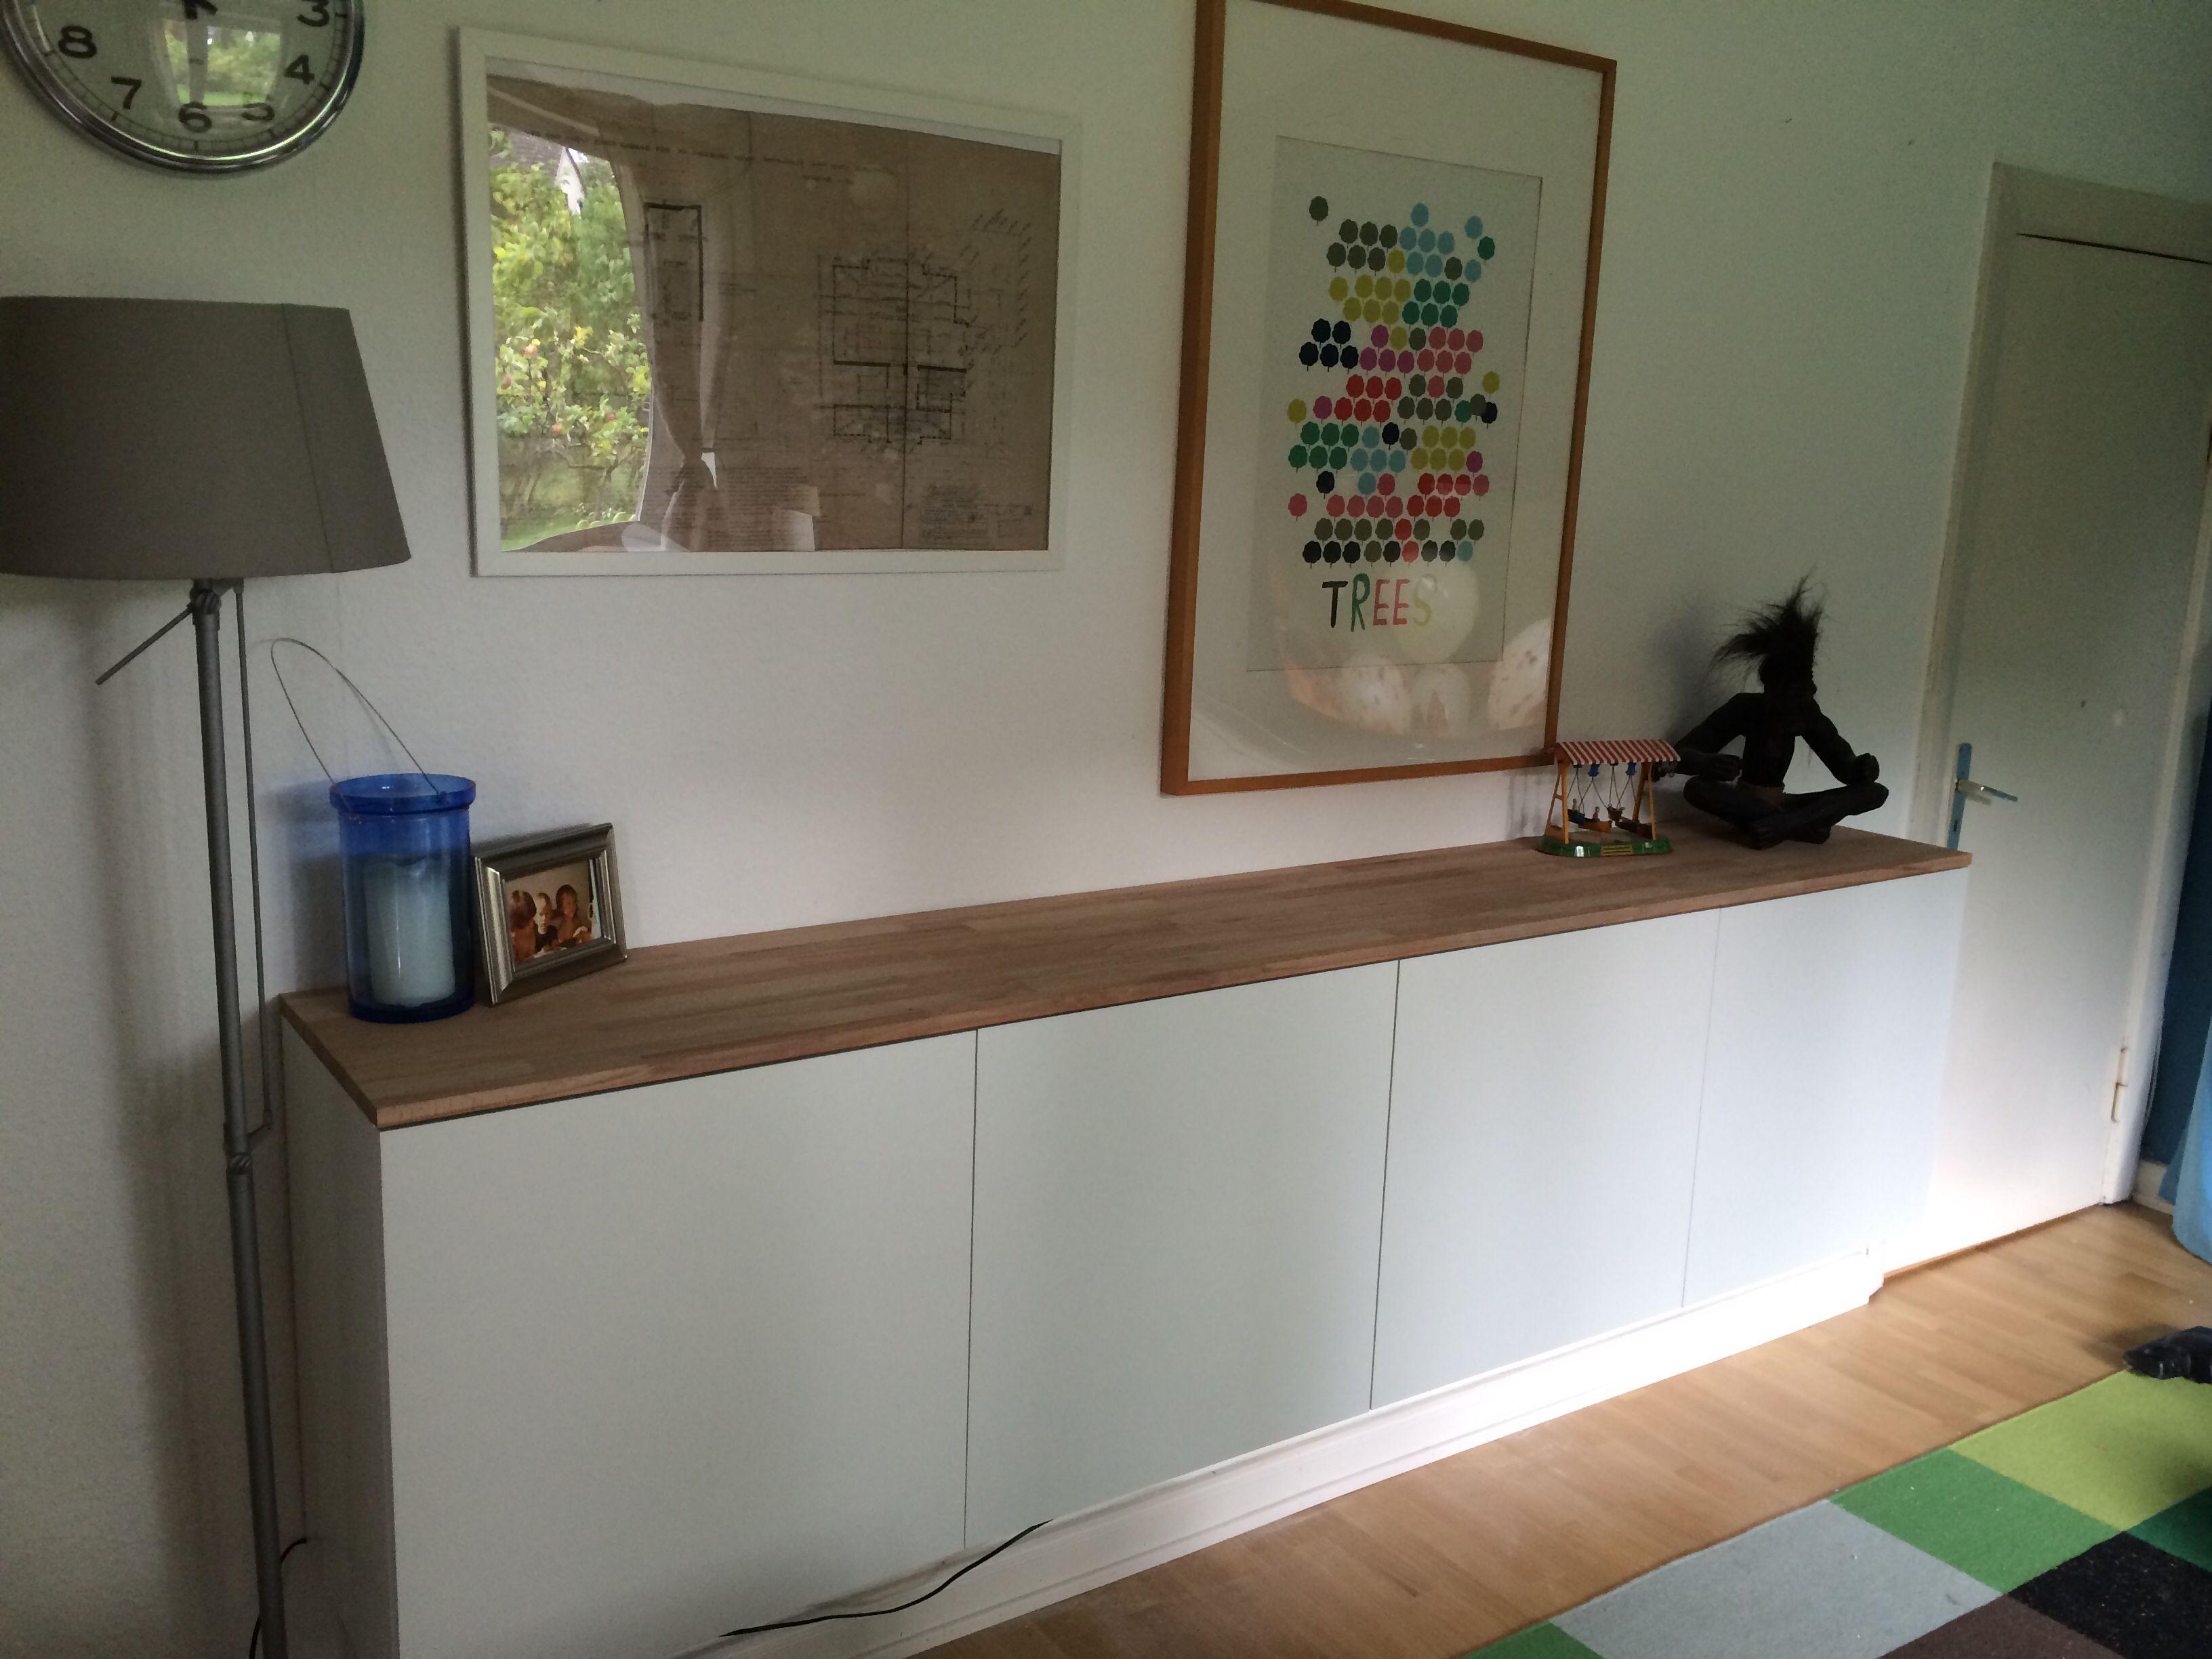 Ikea Küchenunterschrank ~ Floating credenza diy ikea cabinets diy